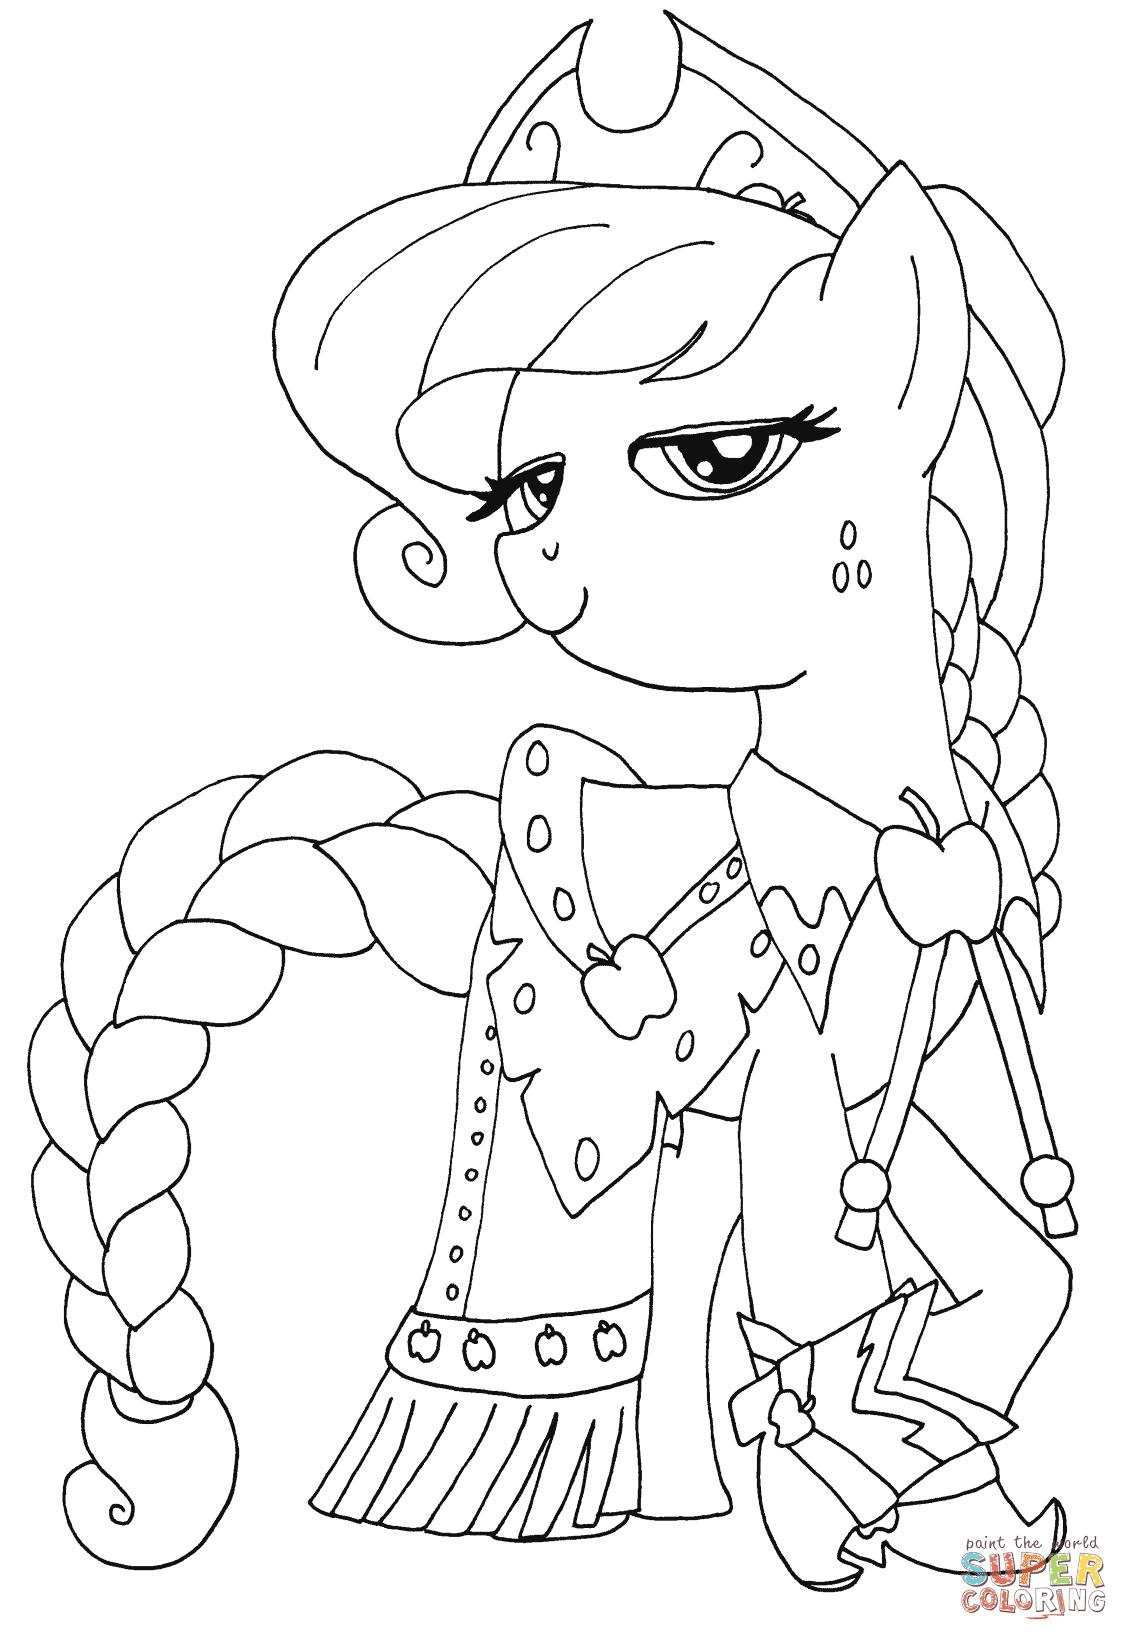 the Princess Applejack